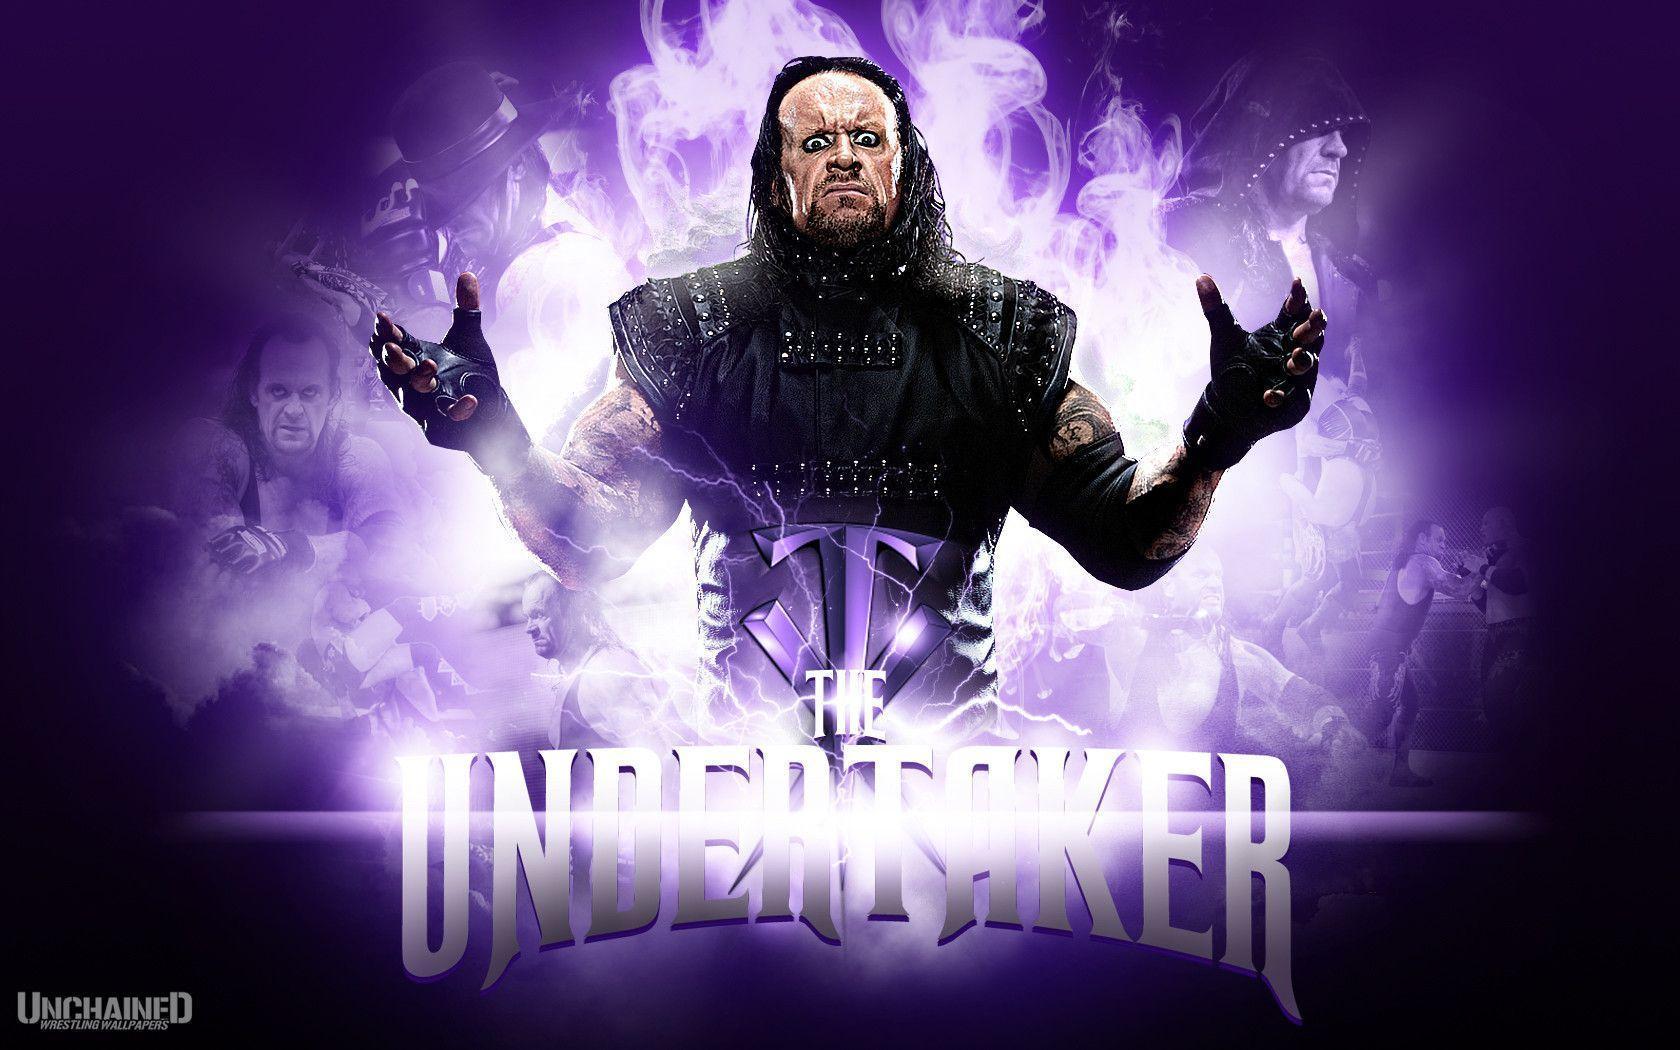 WWE Undertaker The Phenom Wallpaper Unchained